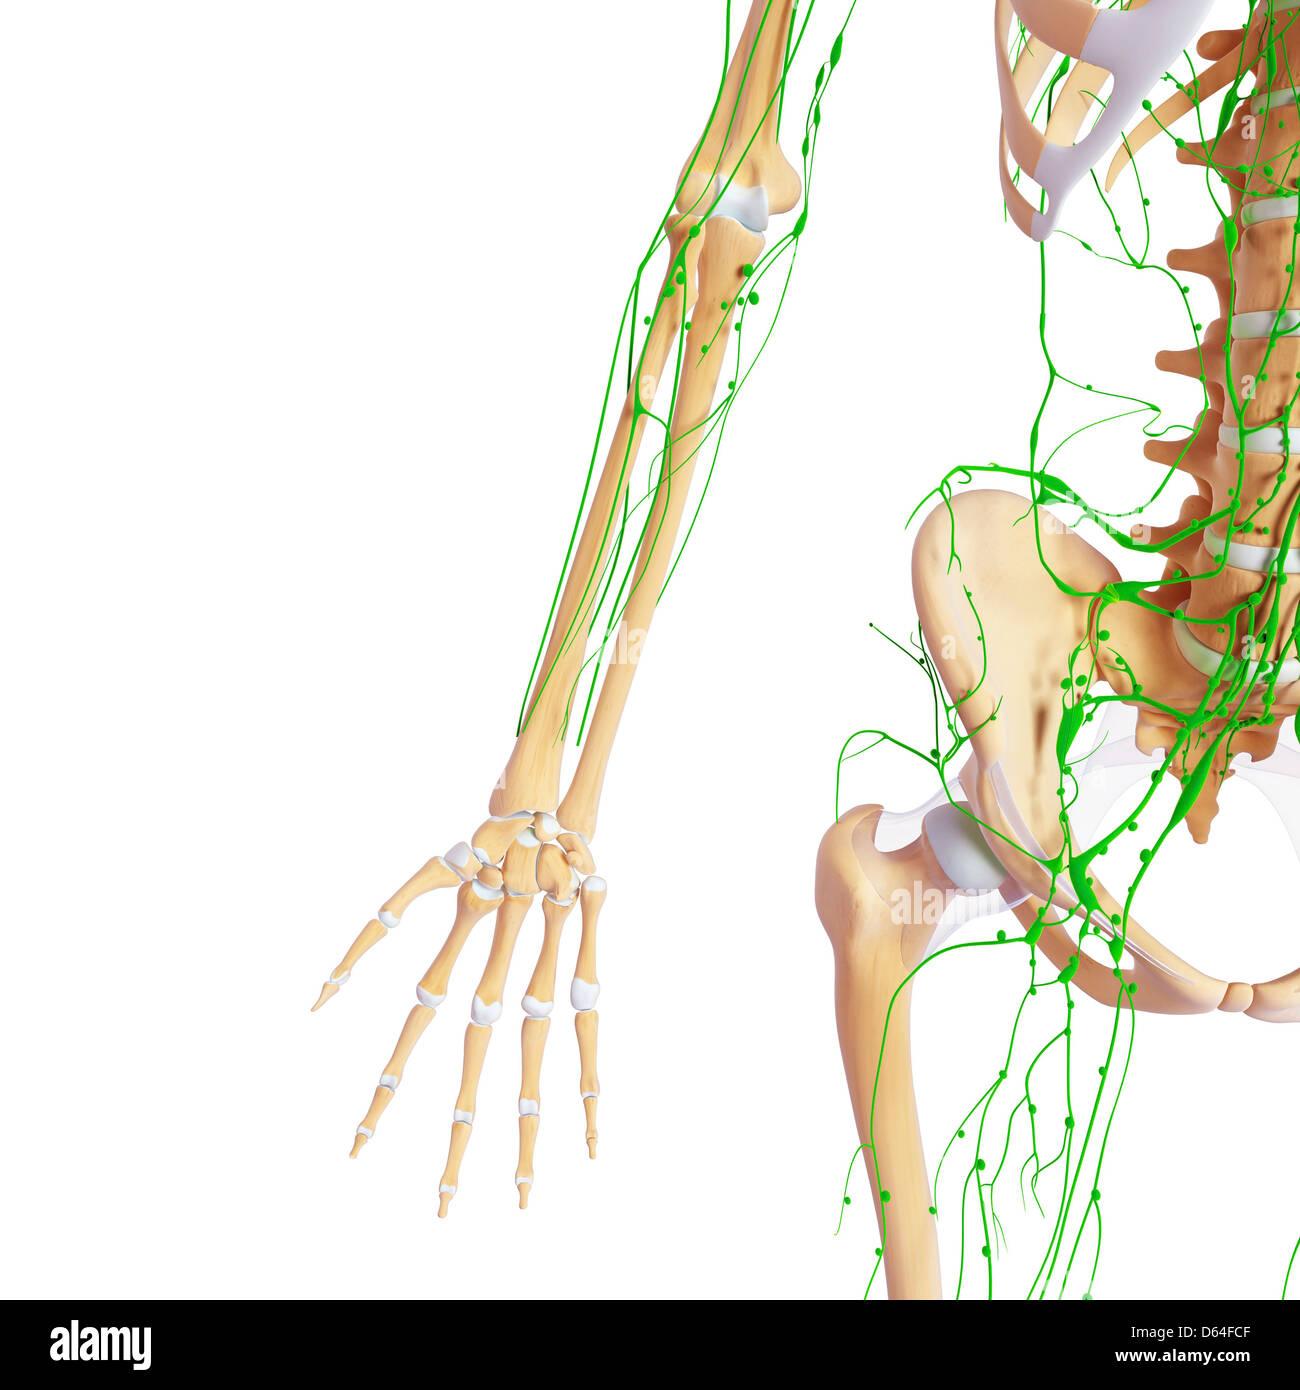 Human anatomy, artwork - Stock Image